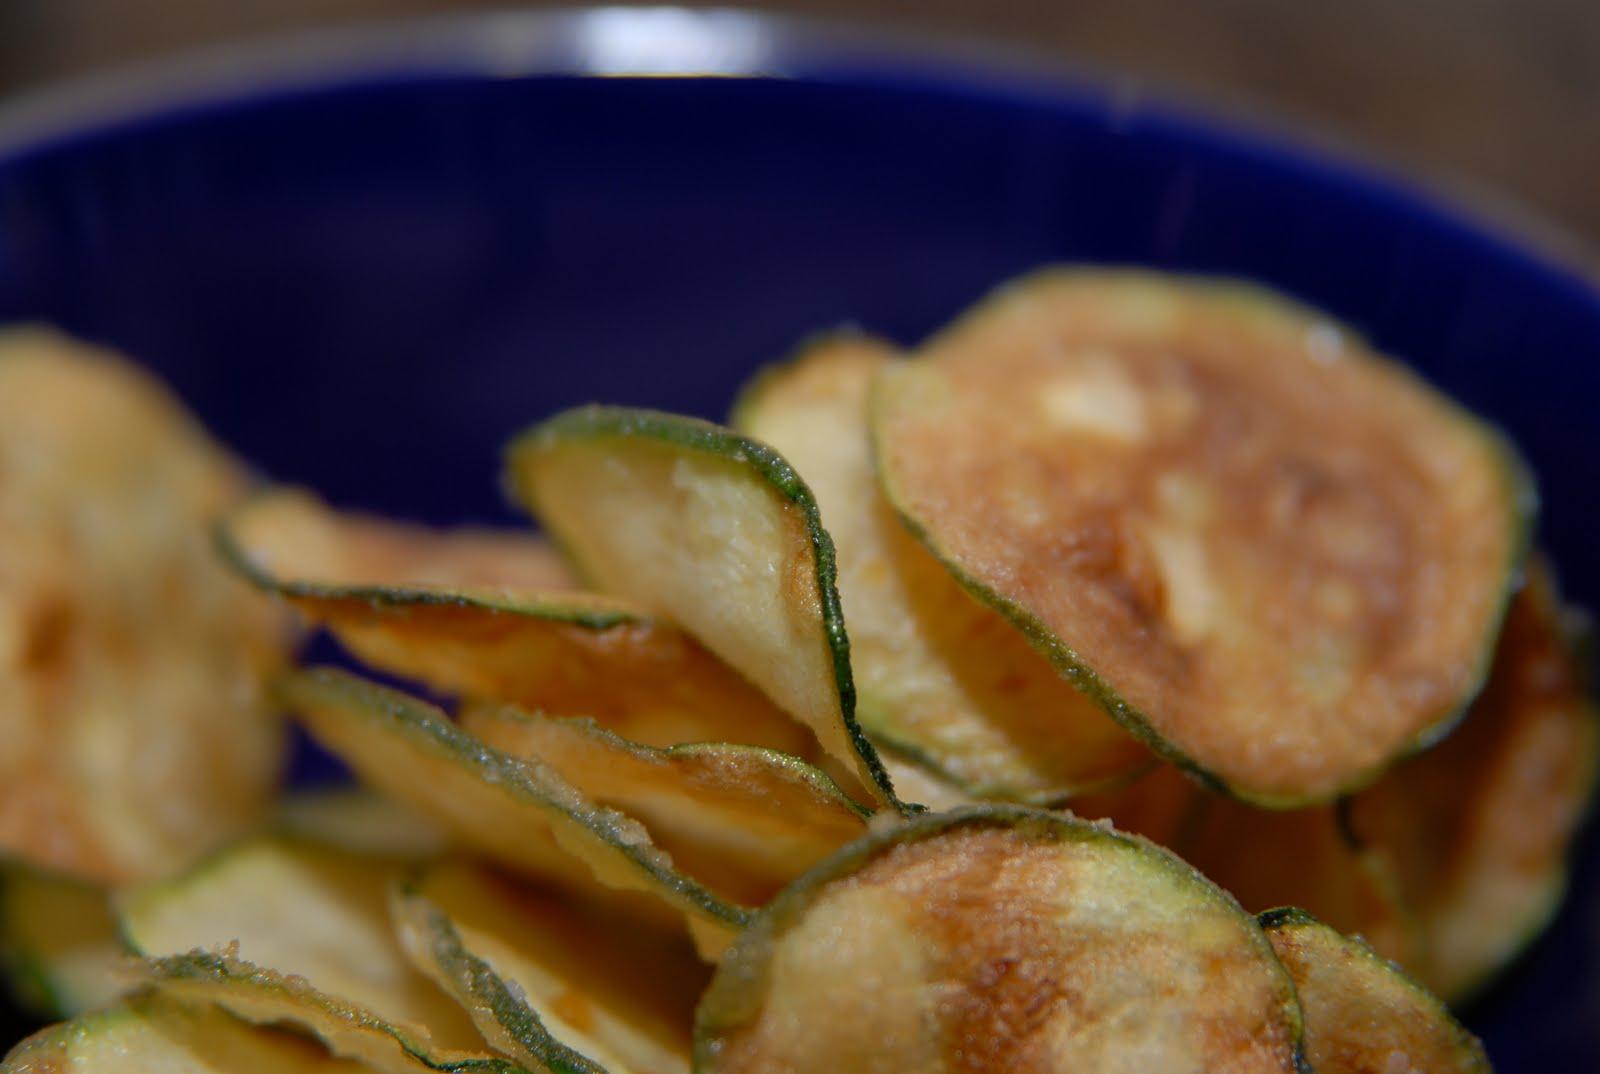 Foodie-bia: Zucchini Chips